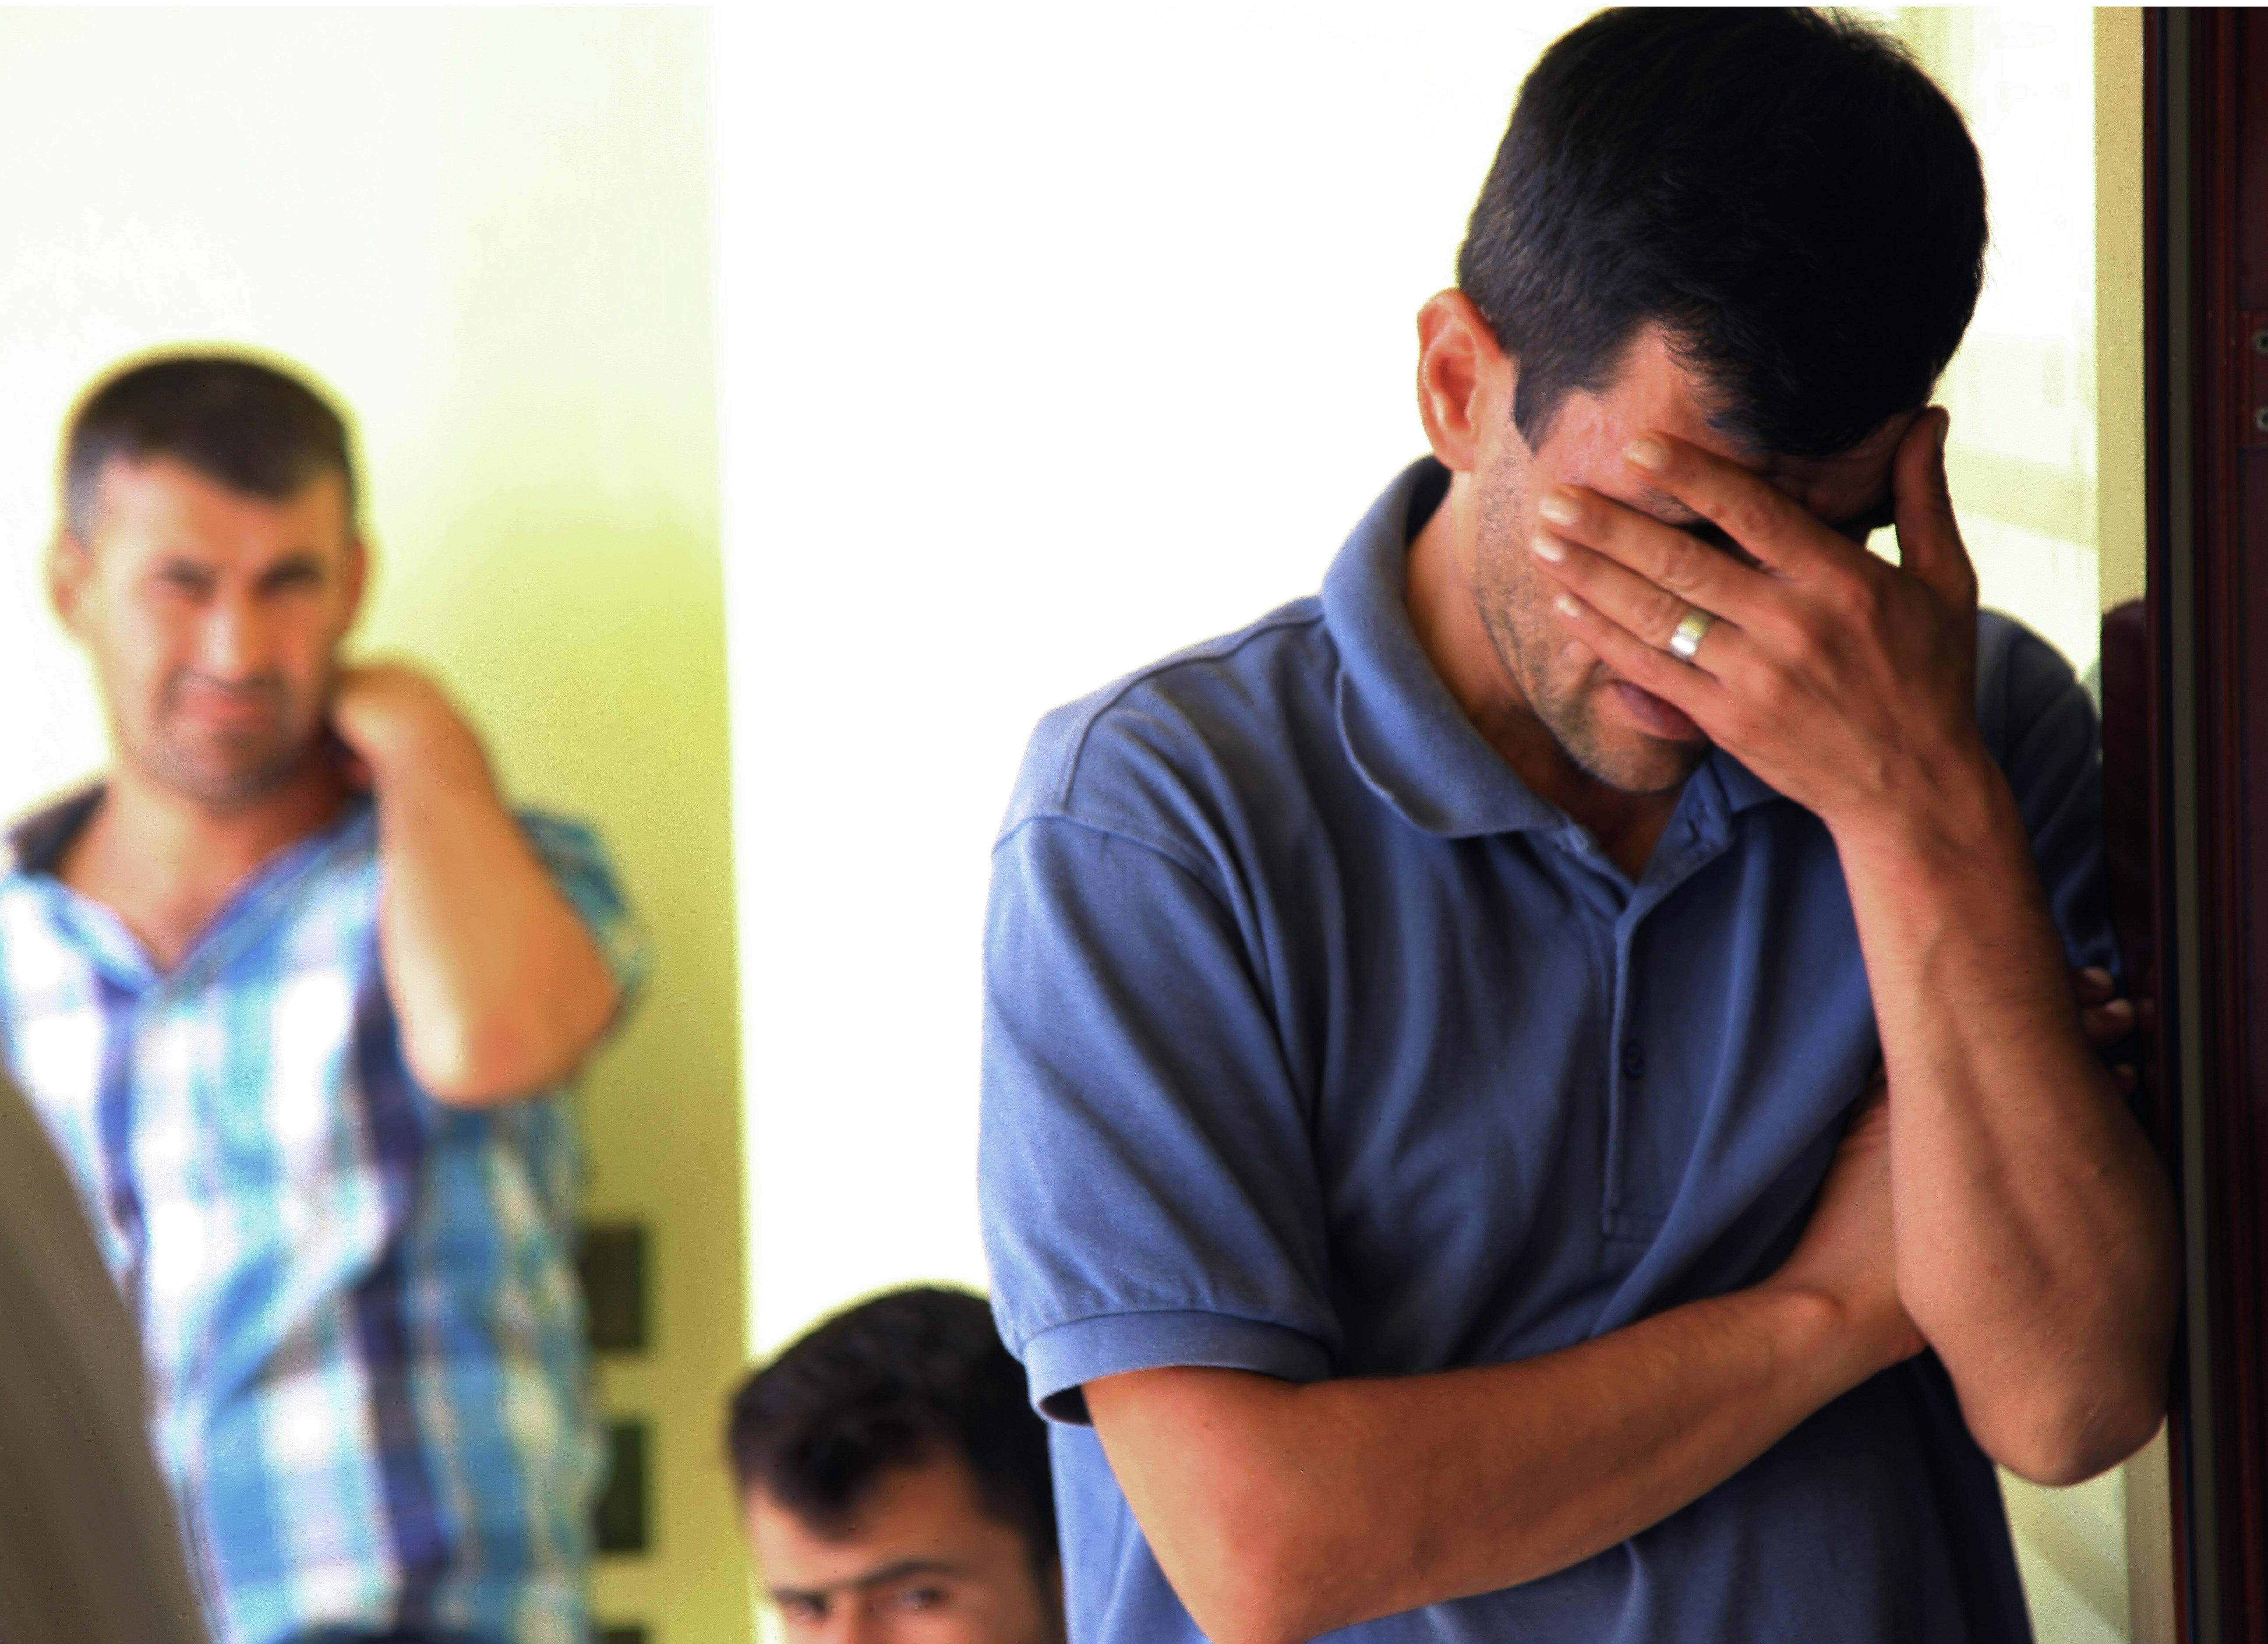 Le Syrien Abdullah Kurdi, père du petit Aylan